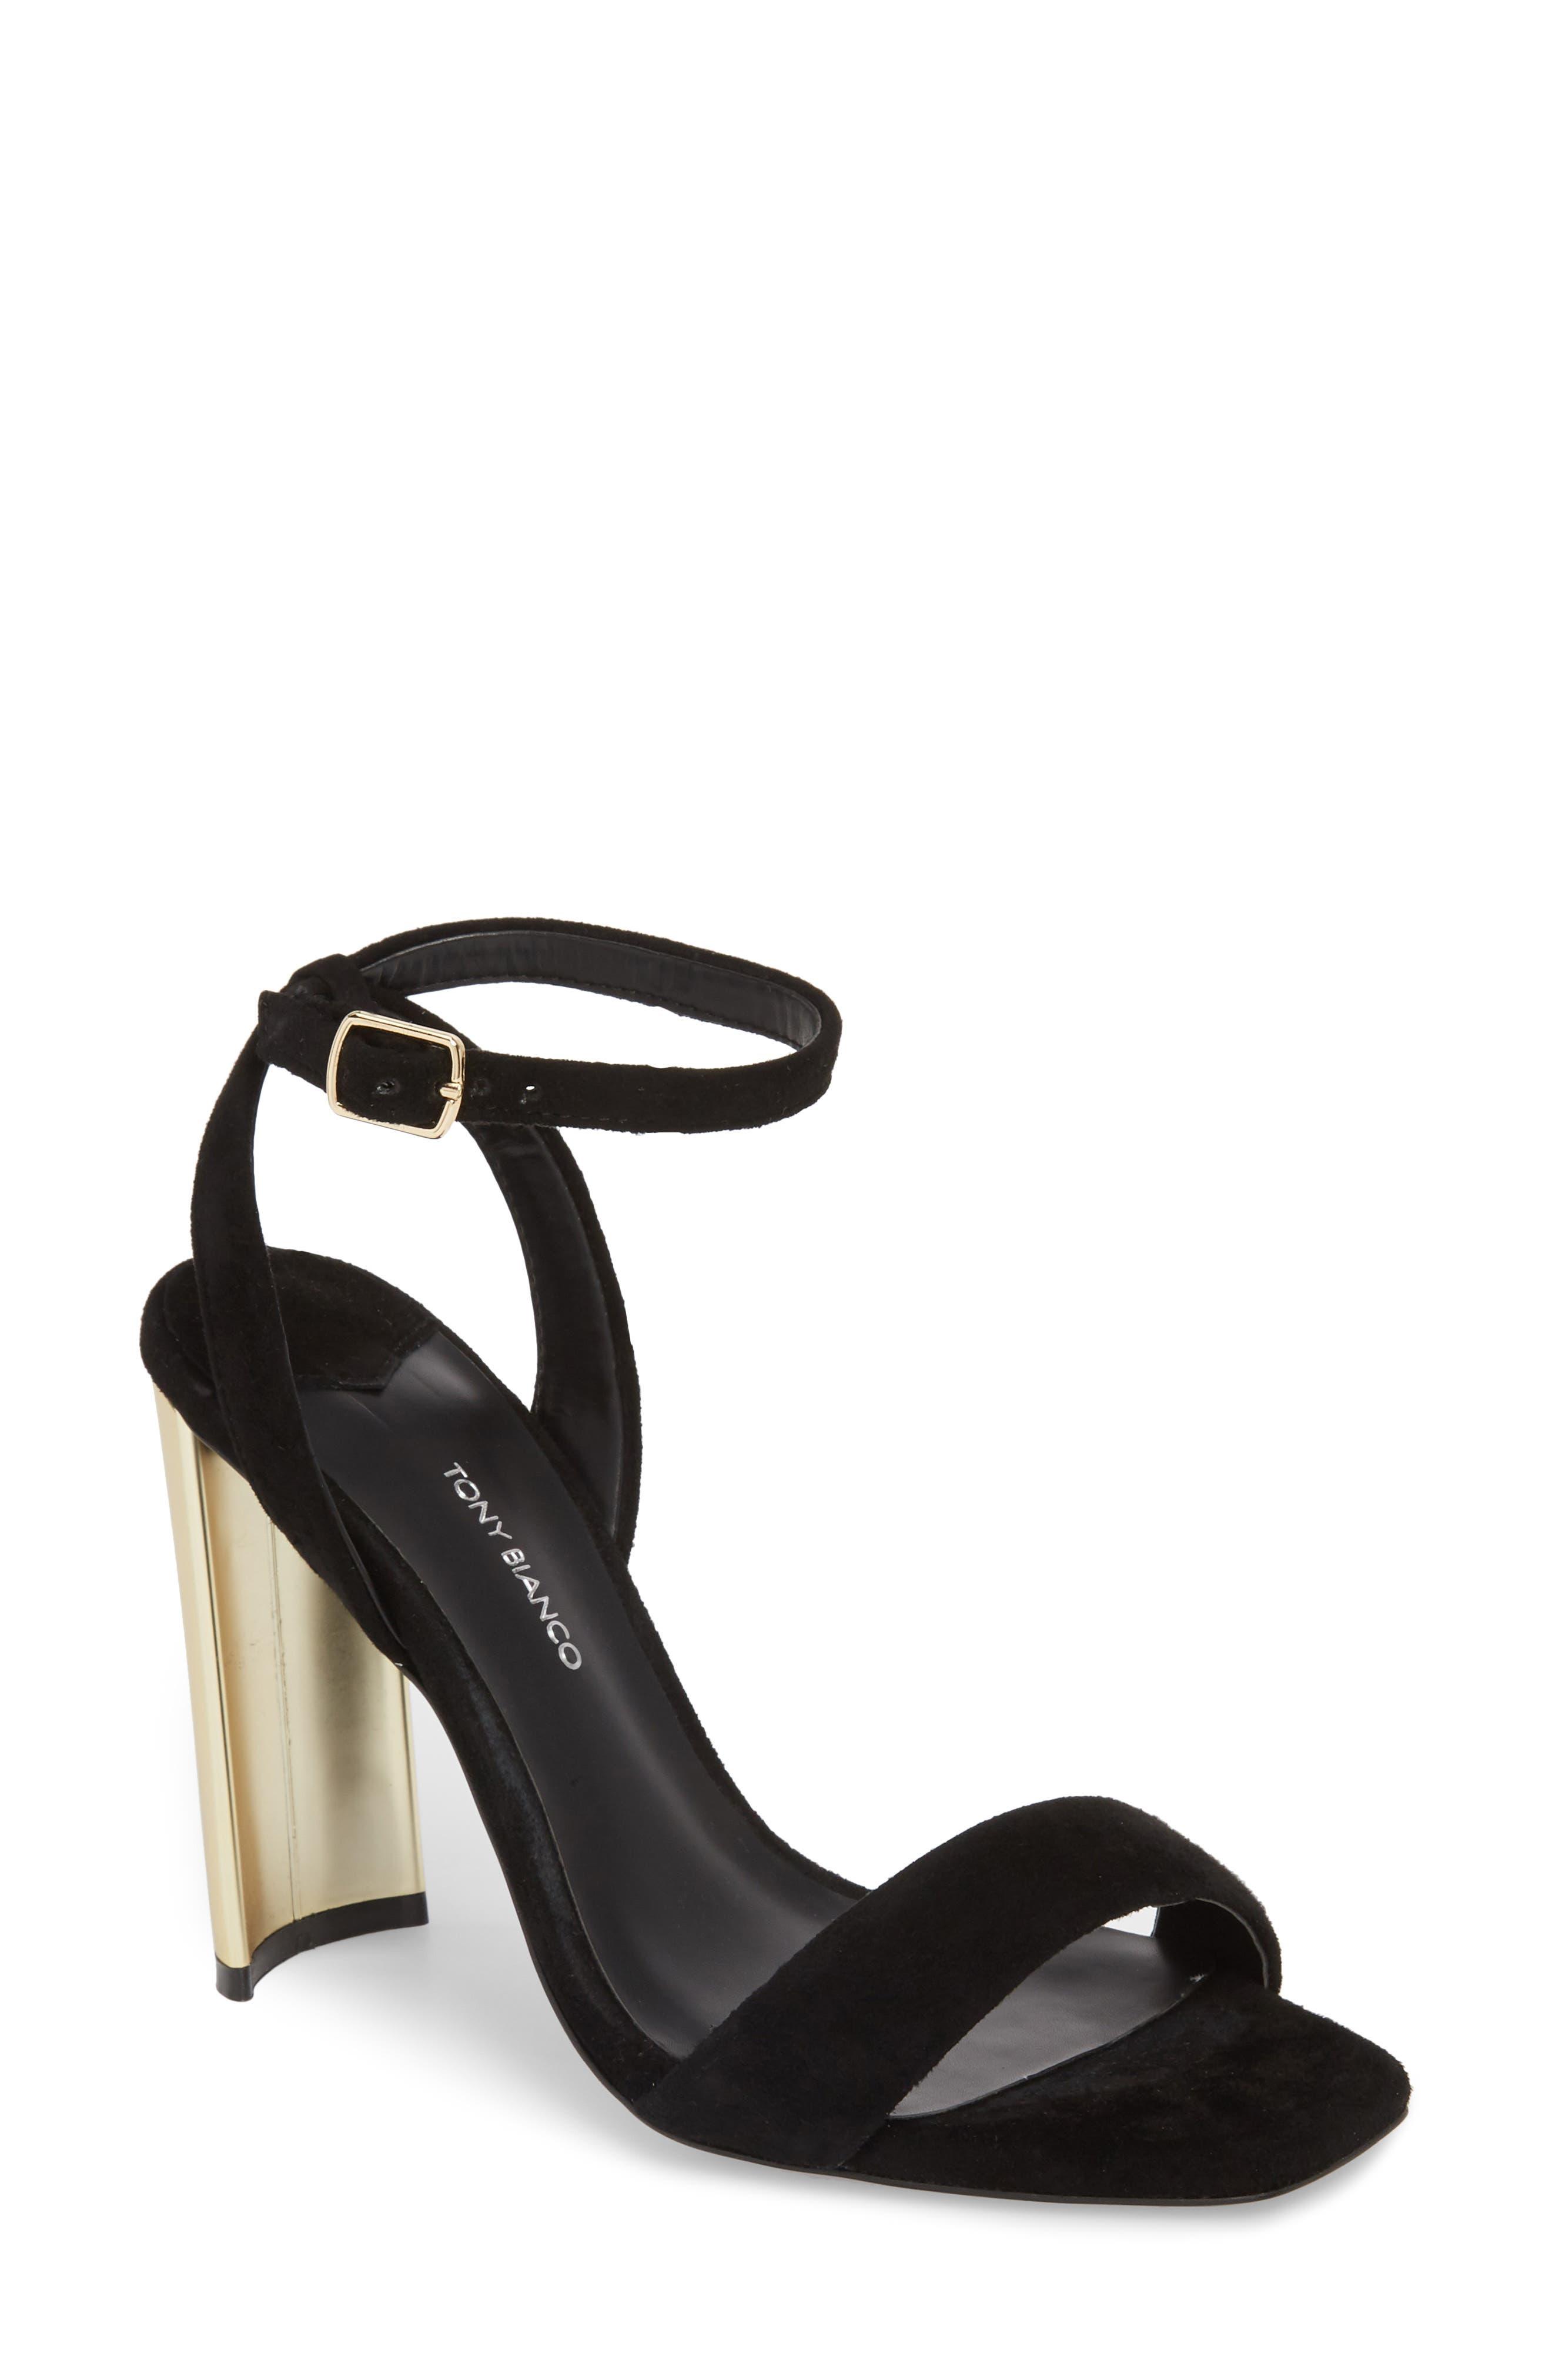 Star Sandal,                         Main,                         color, Black Suede